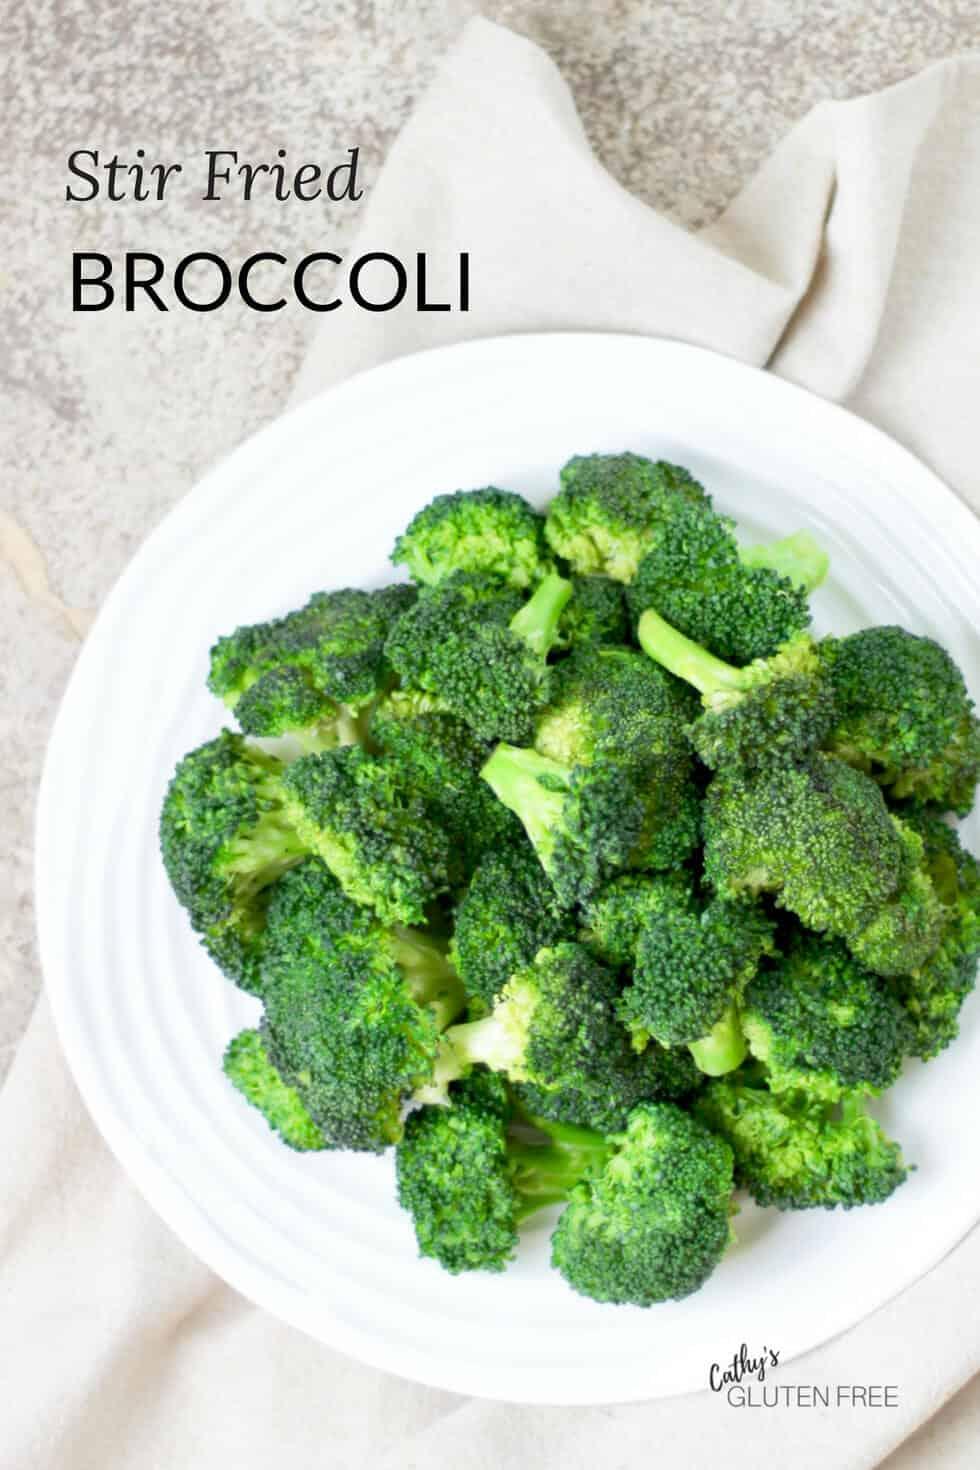 Easy Broccoli Stir Fry with Gluten Free Sauce